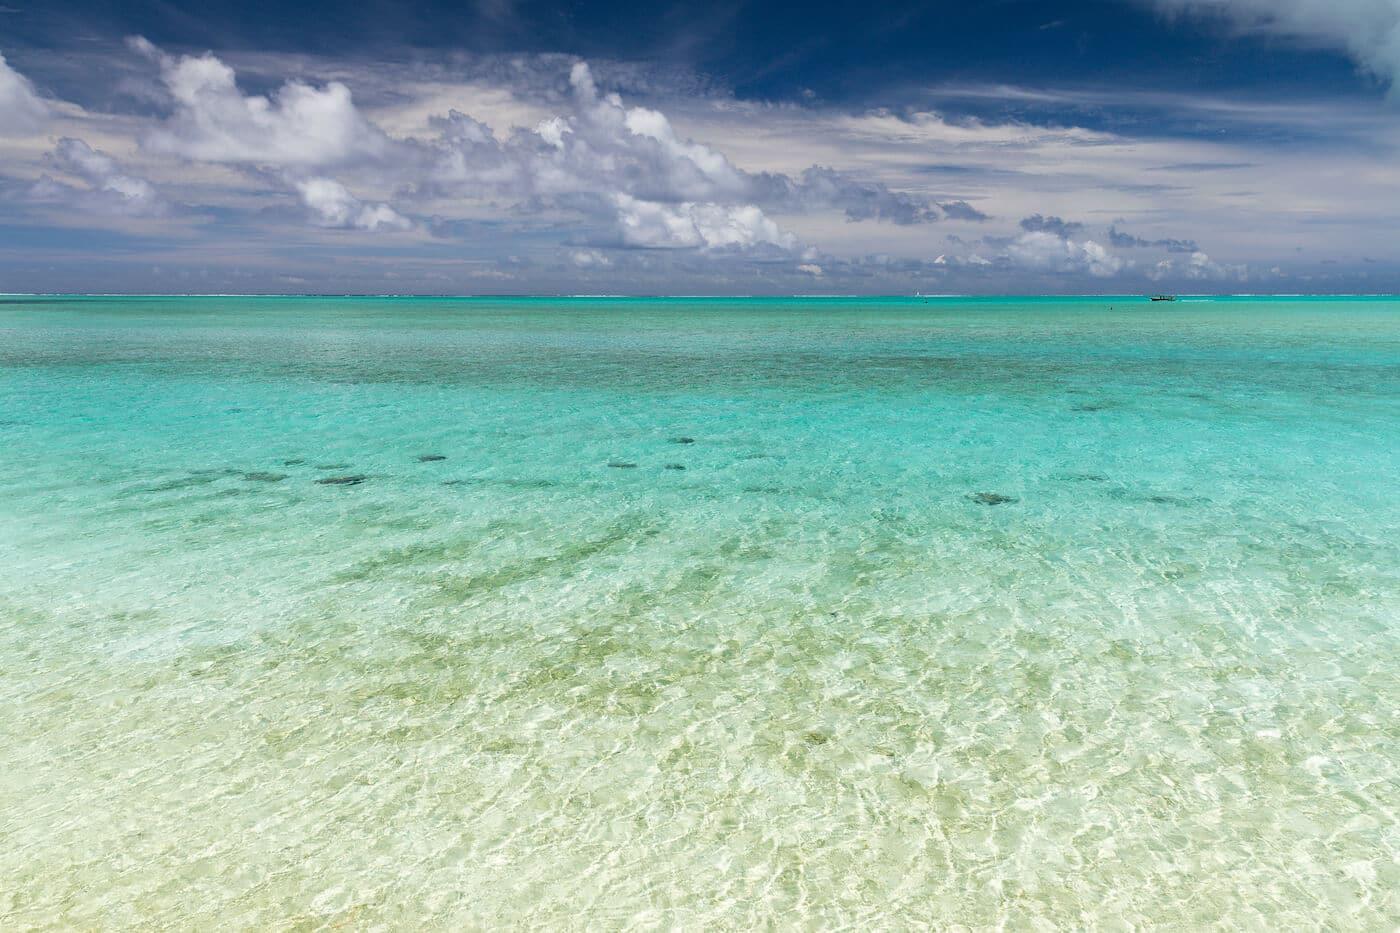 Bora Bora plage et sable blanc